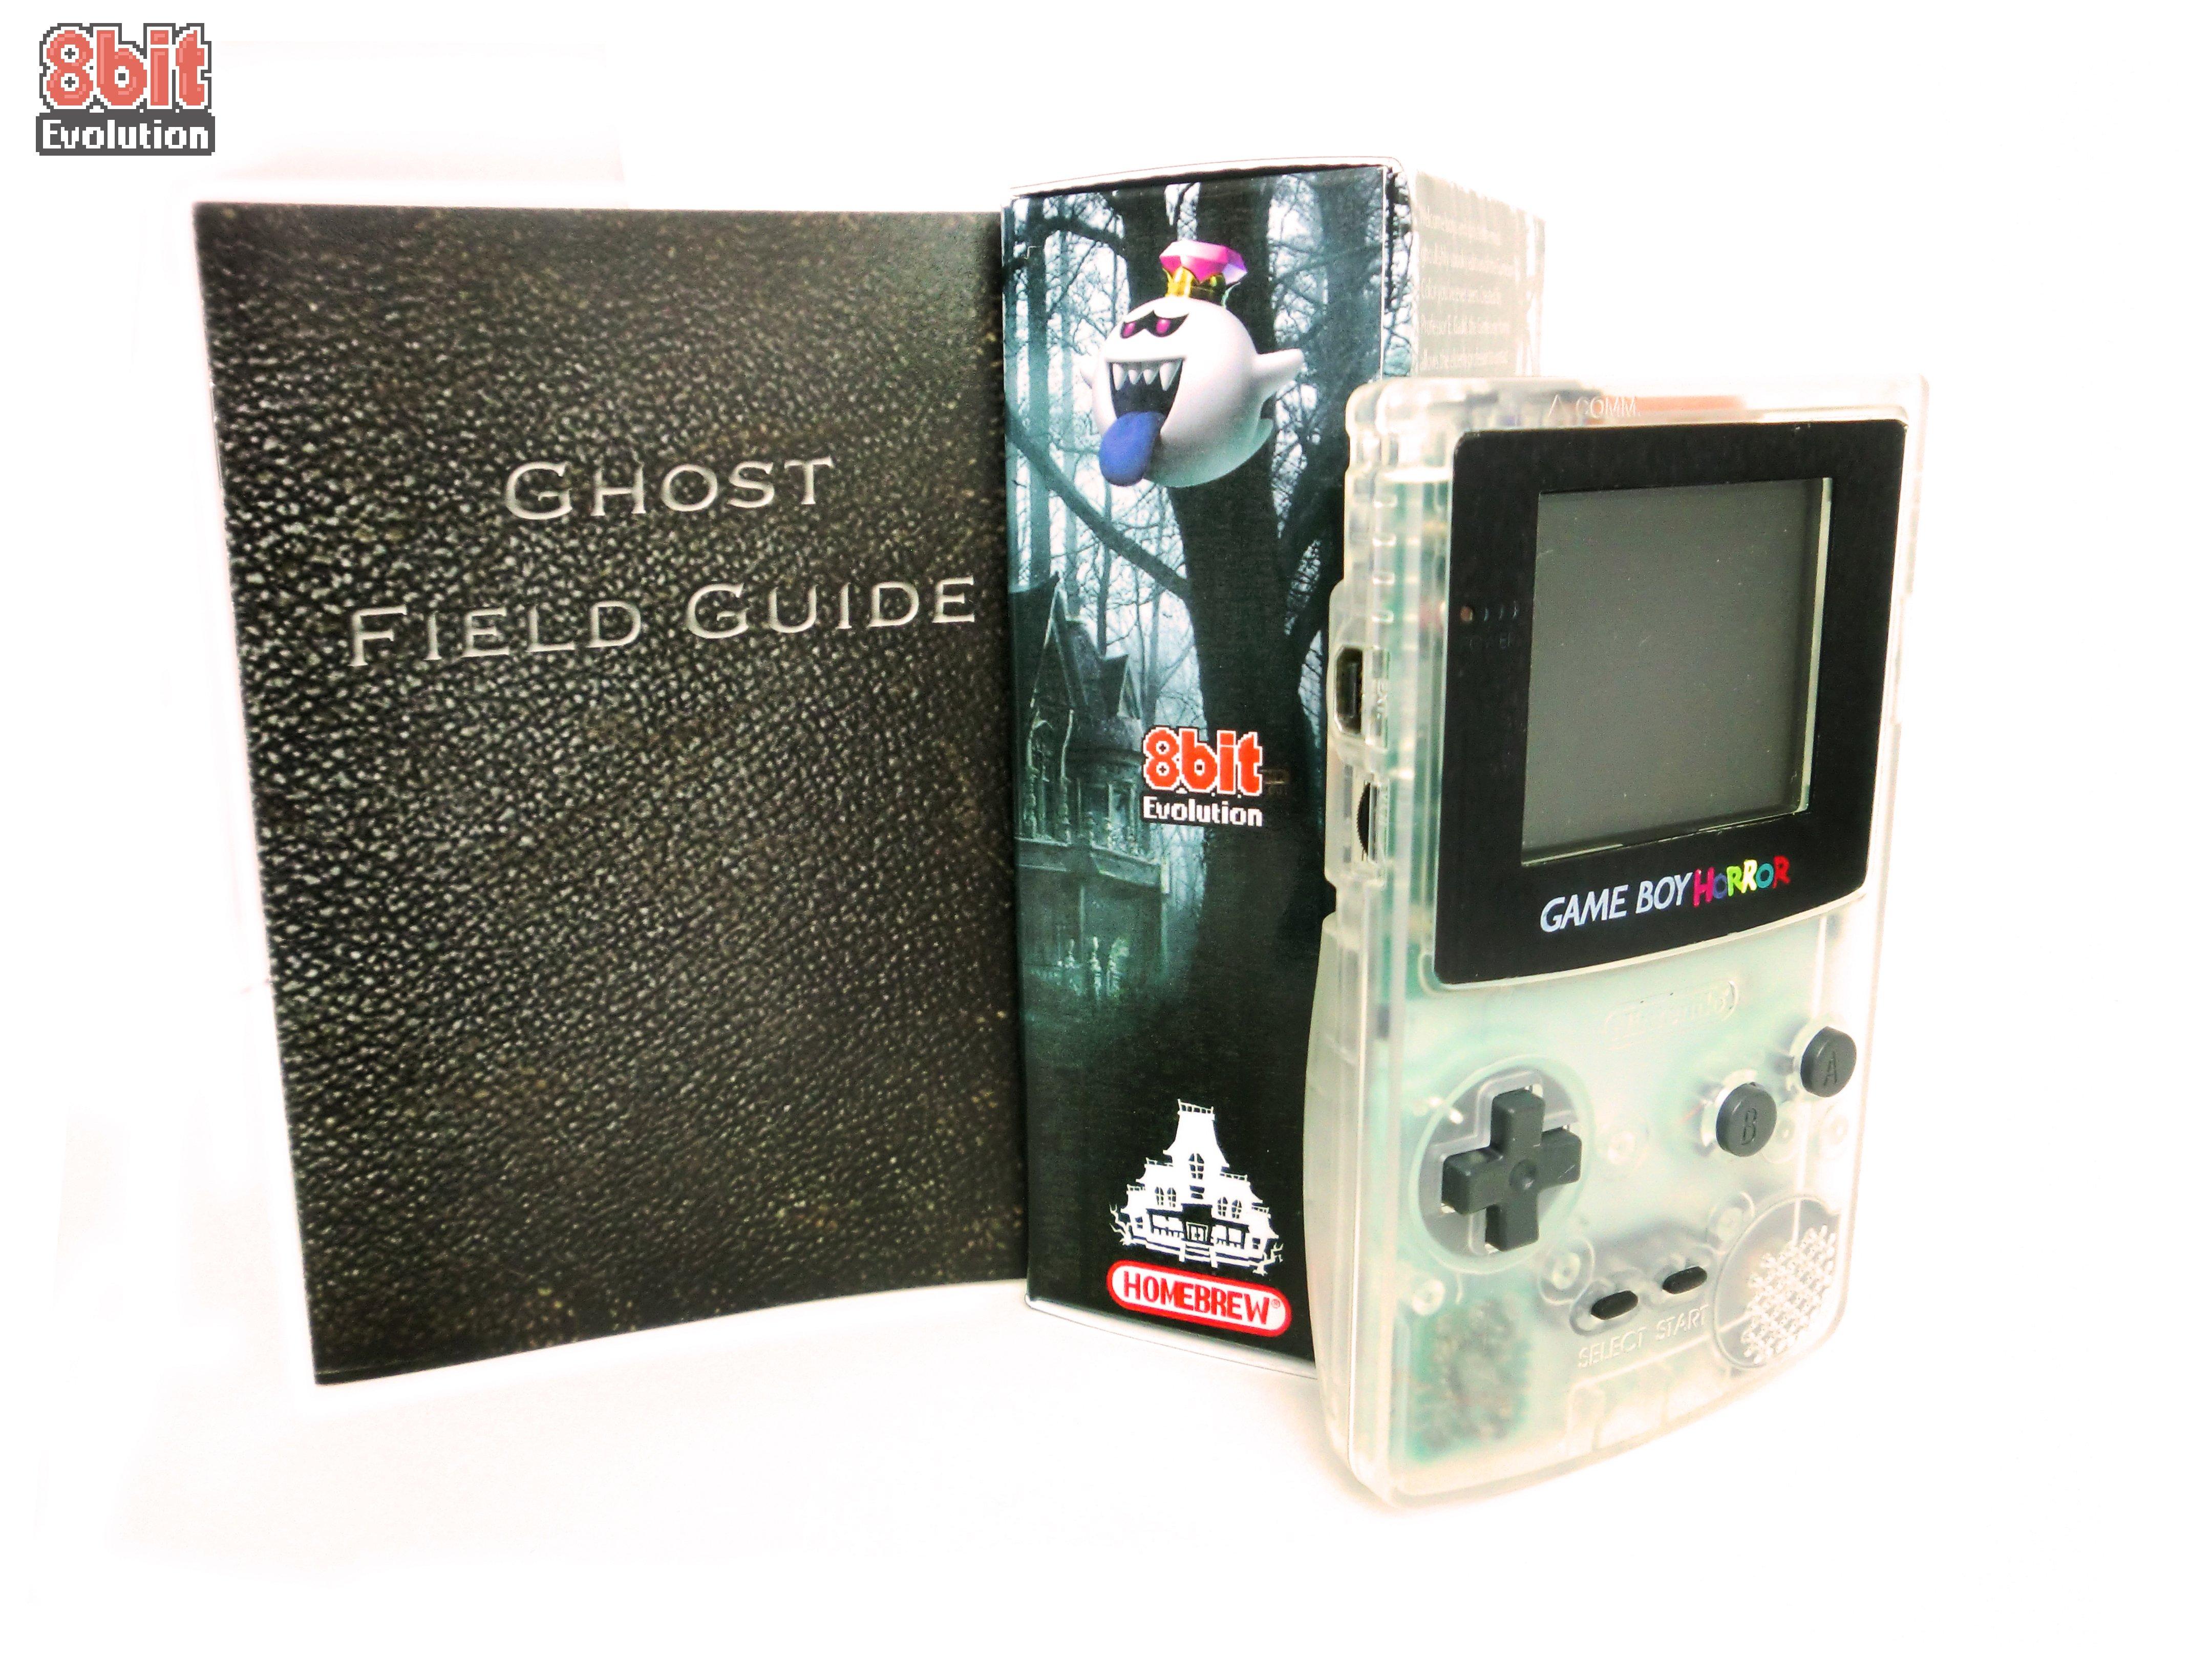 Game boy color kaufen - Game Boy Horror Game Boy Color System By 8bit Evolution Luigis Mansion Unofficial Collectors Item